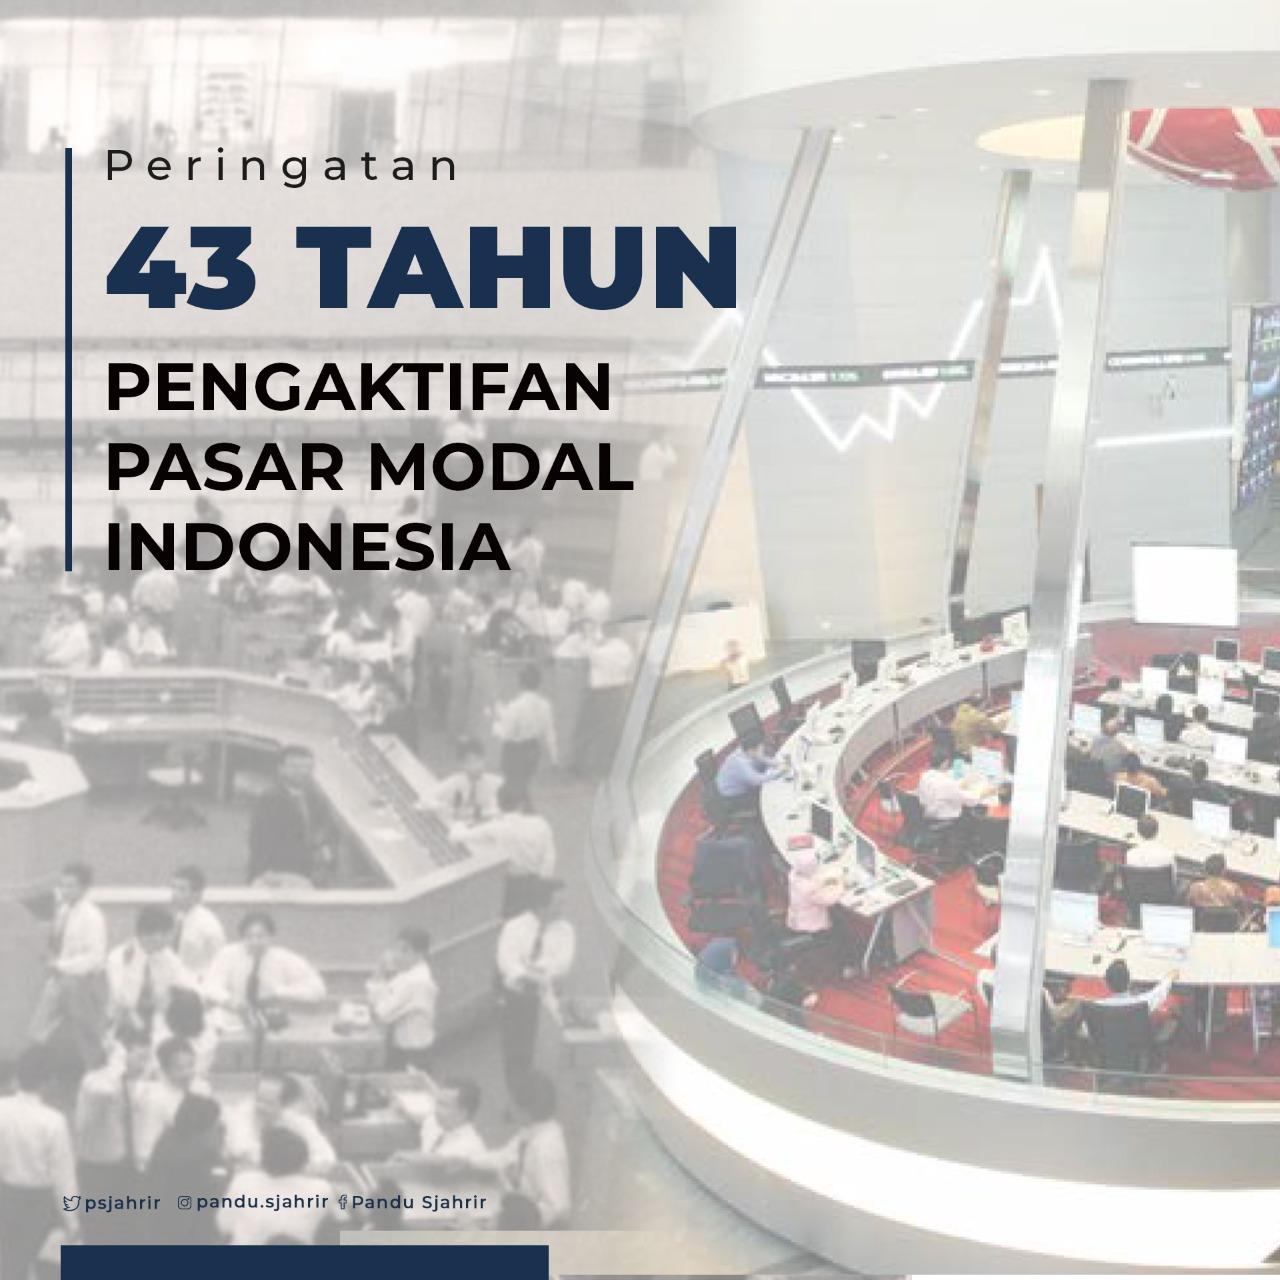 Peringatan Pengakltifan Pasar Modal indonesia